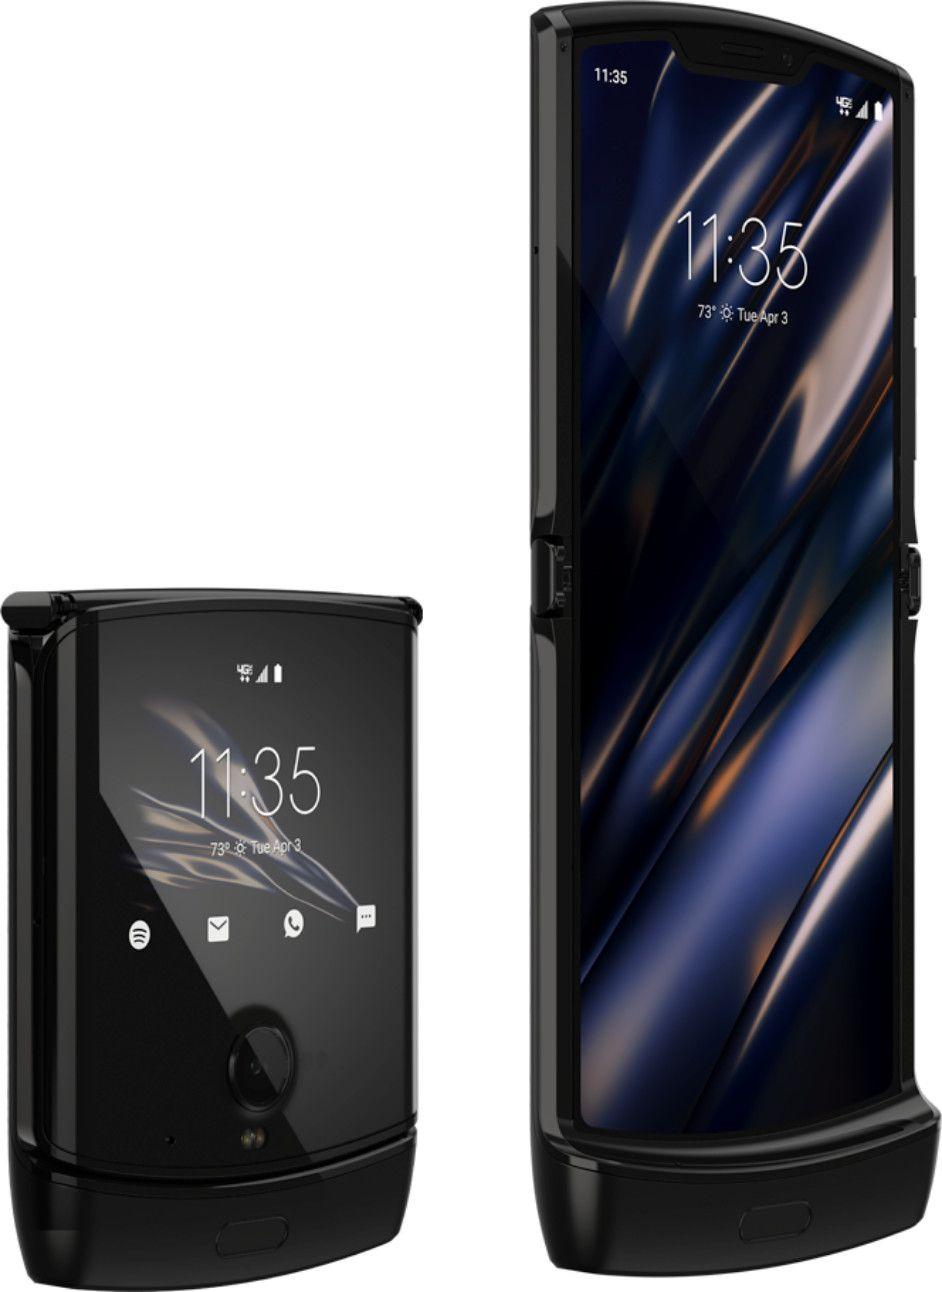 "Motorola Razr 2019 6,2"" FHD OLED Klapphandy mit Außendisplay 6/128GB (Snapdragon 710, 201K AnTuTu, 16 MP Kamera, USB-C, NFC)"